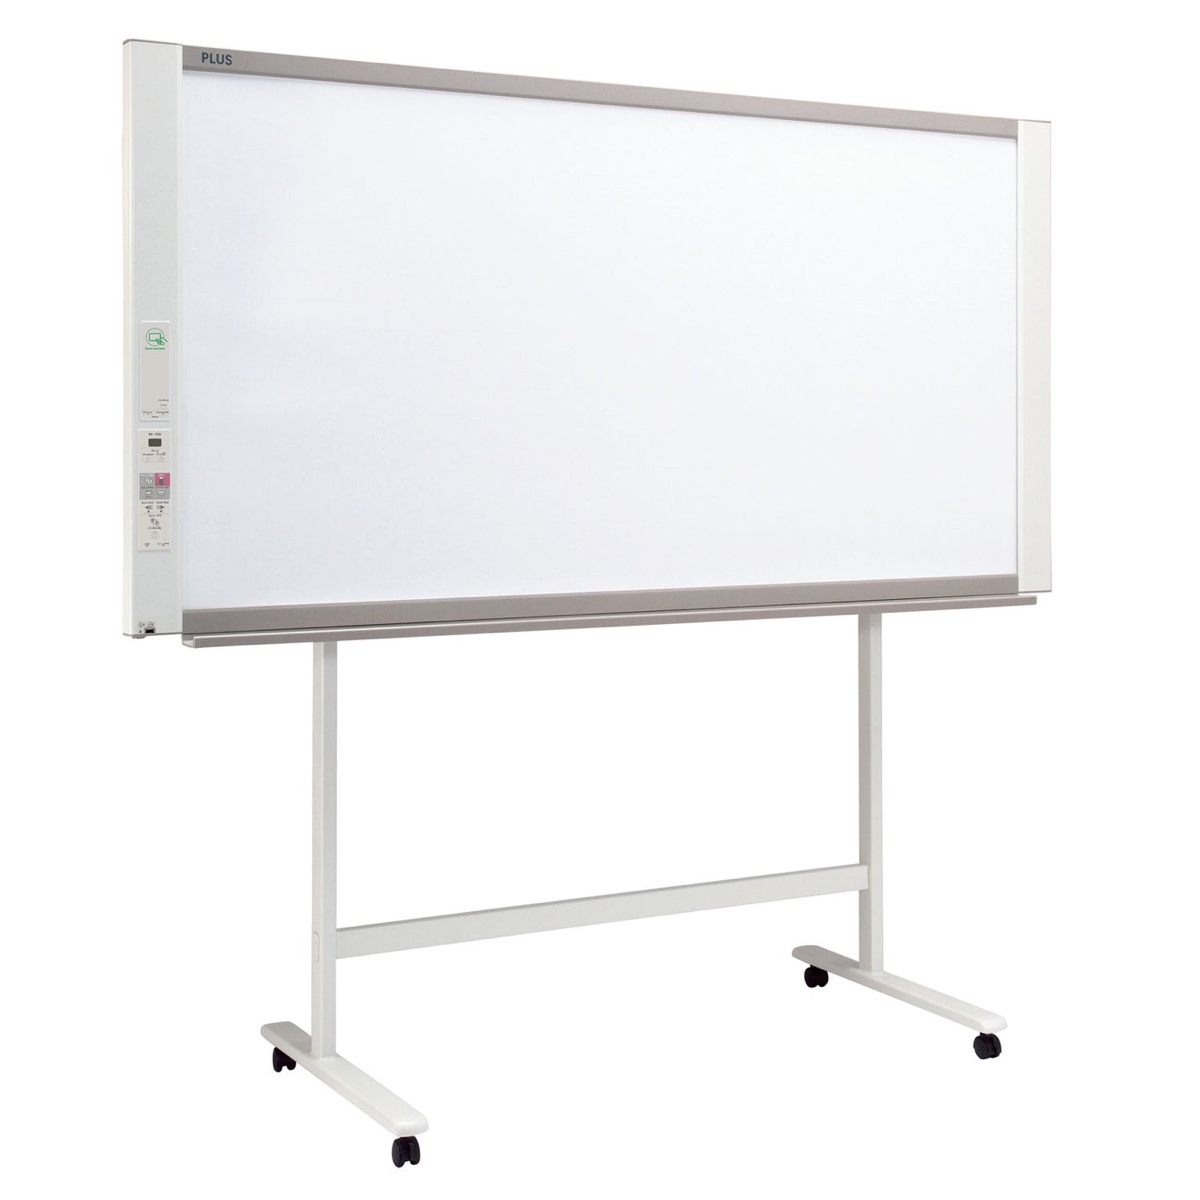 PLUS Whiteboards:  The PLUS Copyboard N-32W